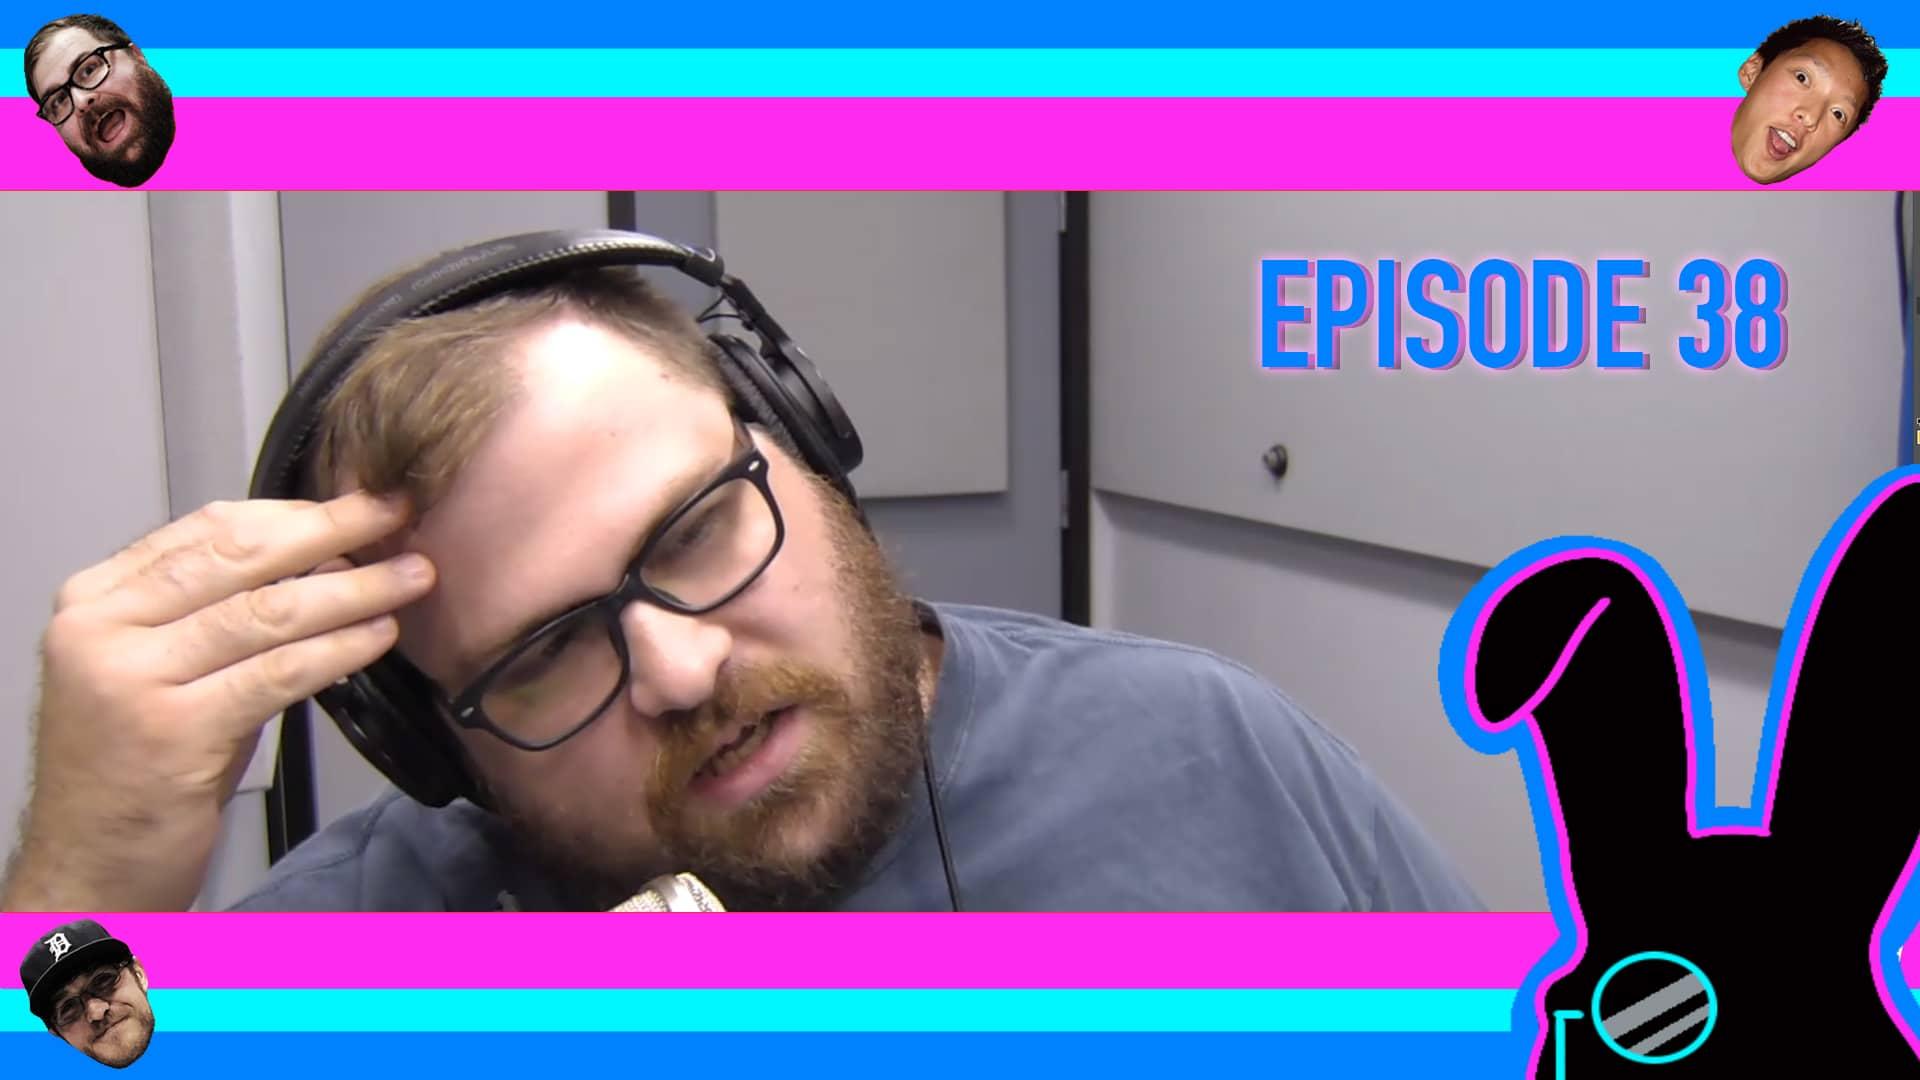 Geektainment Weekly - Episode 38